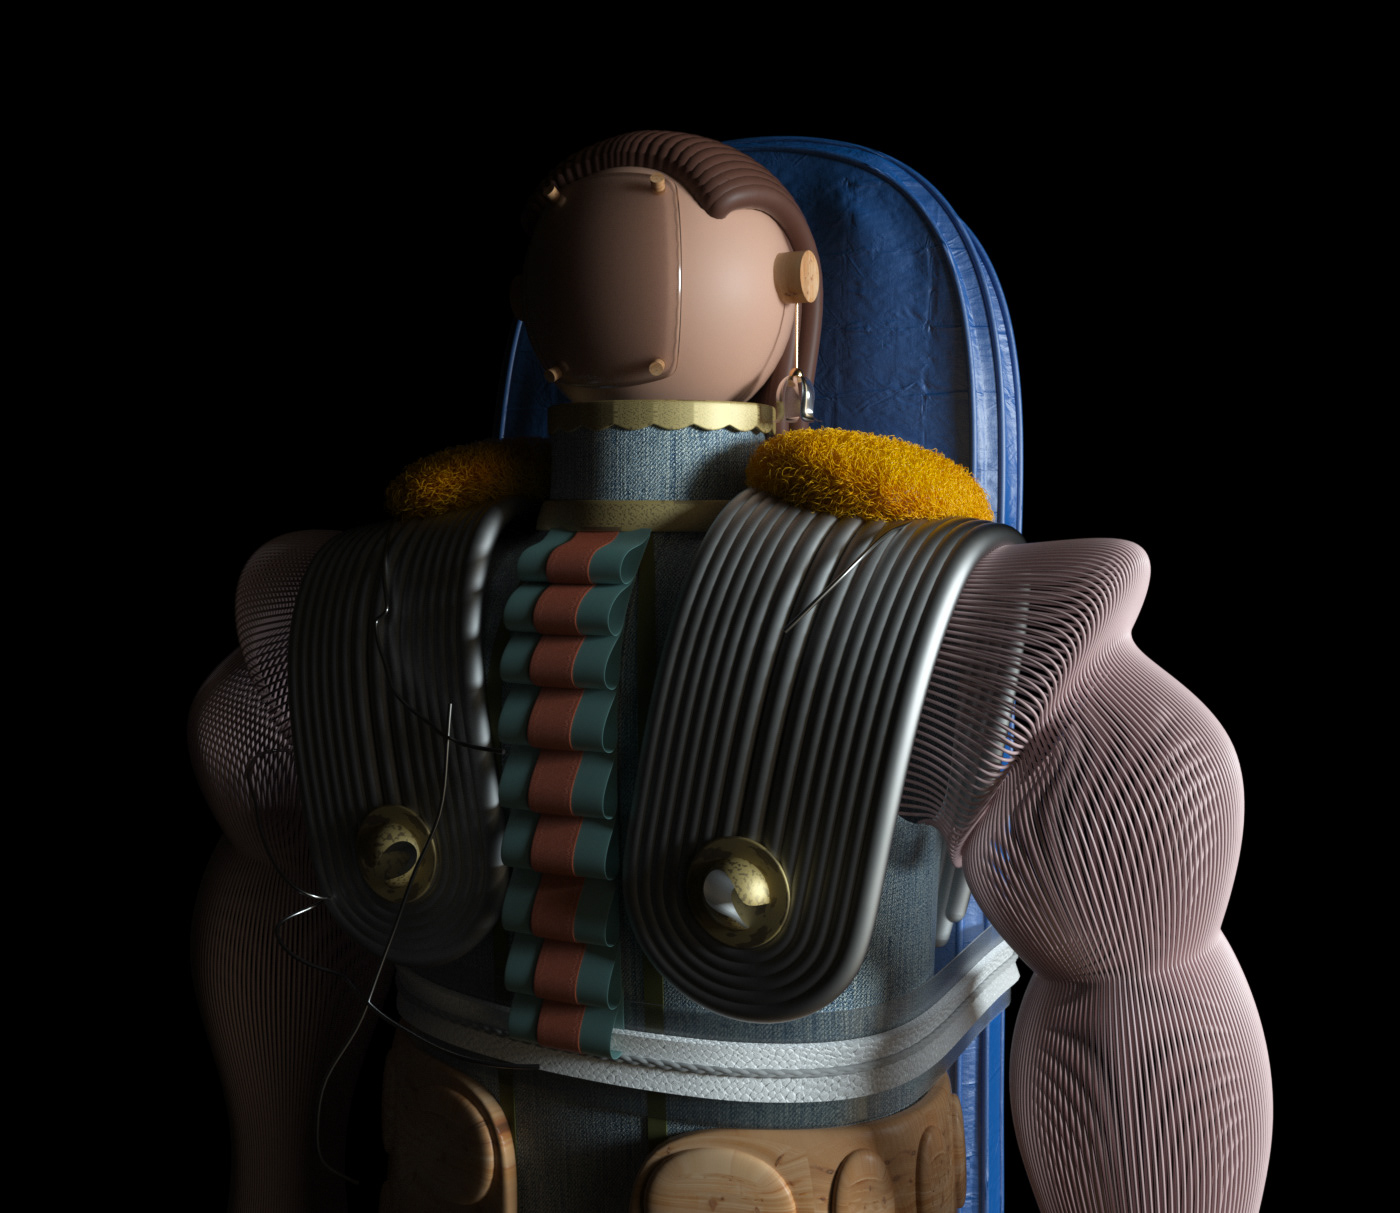 Image may contain: cartoon and helmet